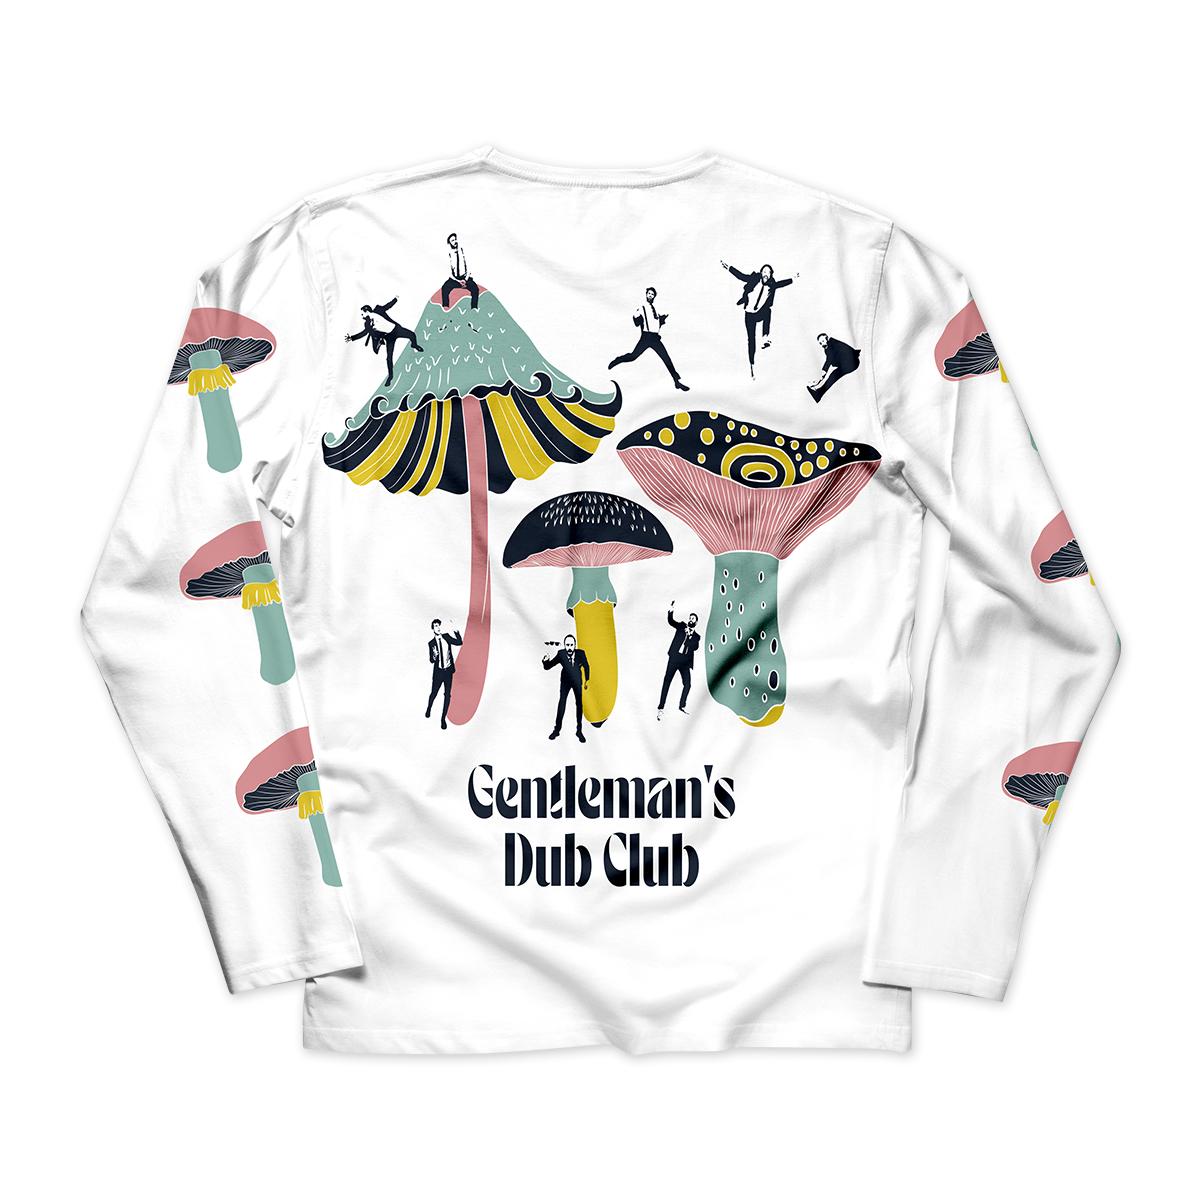 Gentleman's Dub Club Unisex Down To Earth Long Sleeve Shirt